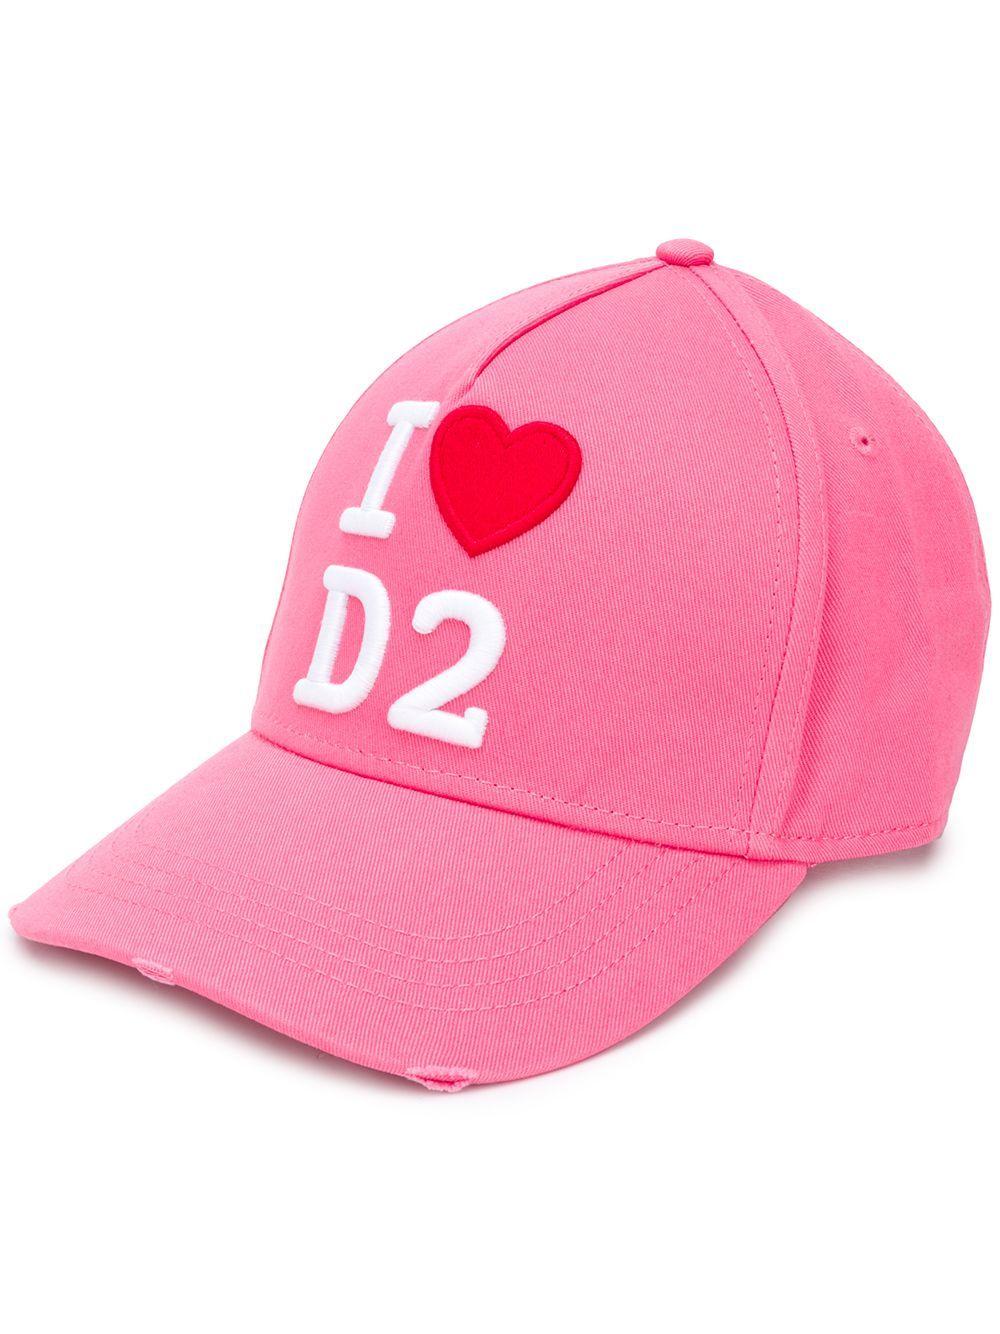 Dsquared2 DSQUARED2 WOMEN'S PINK COTTON HAT